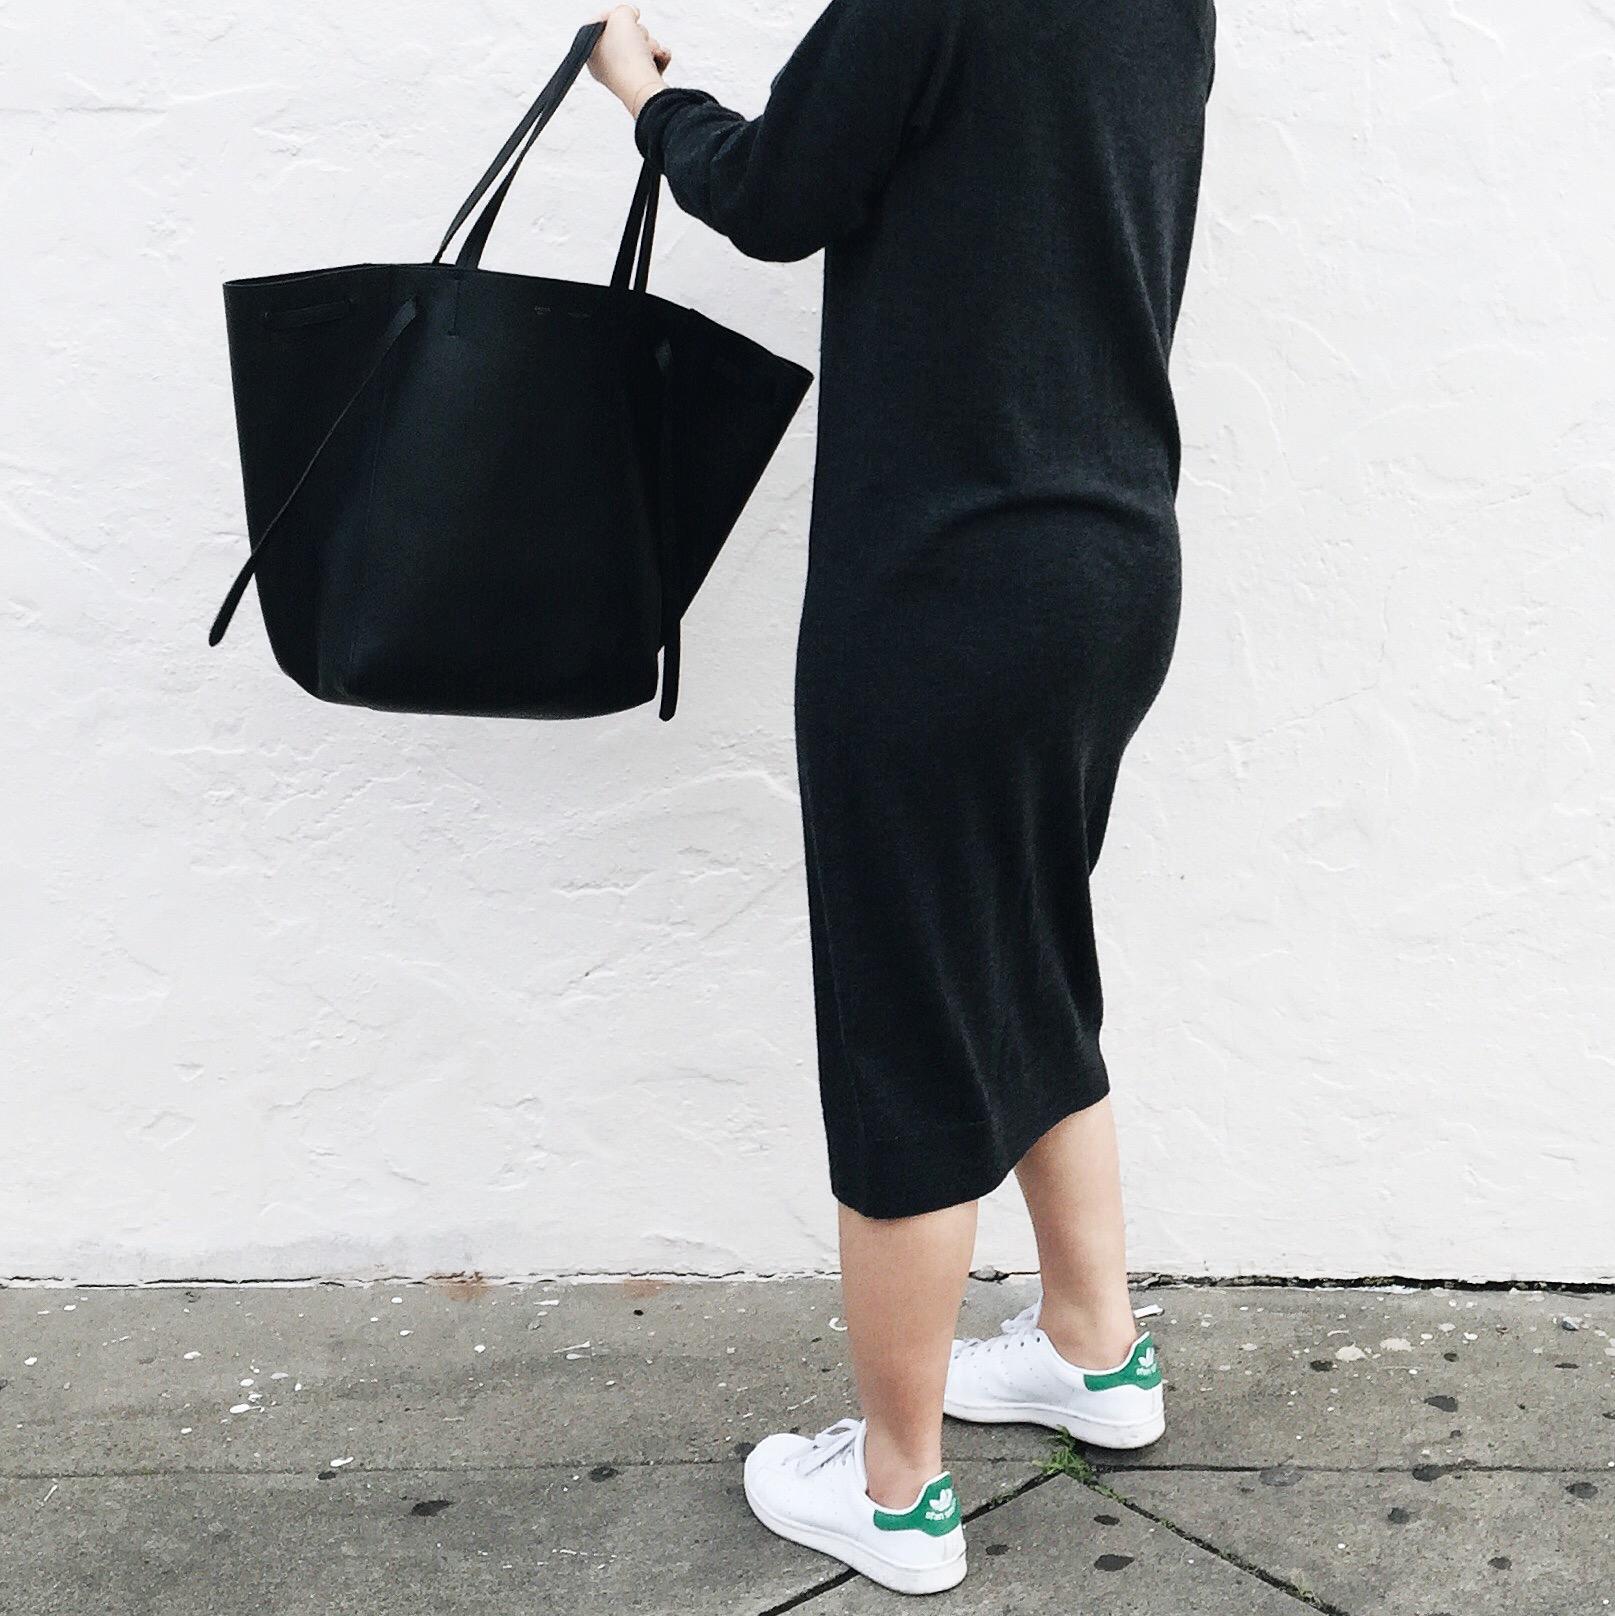 ASOS WHITE   wool dress   / ADIDAS   Stan Smith sneakers   / CELINE  Phantom cabas tote